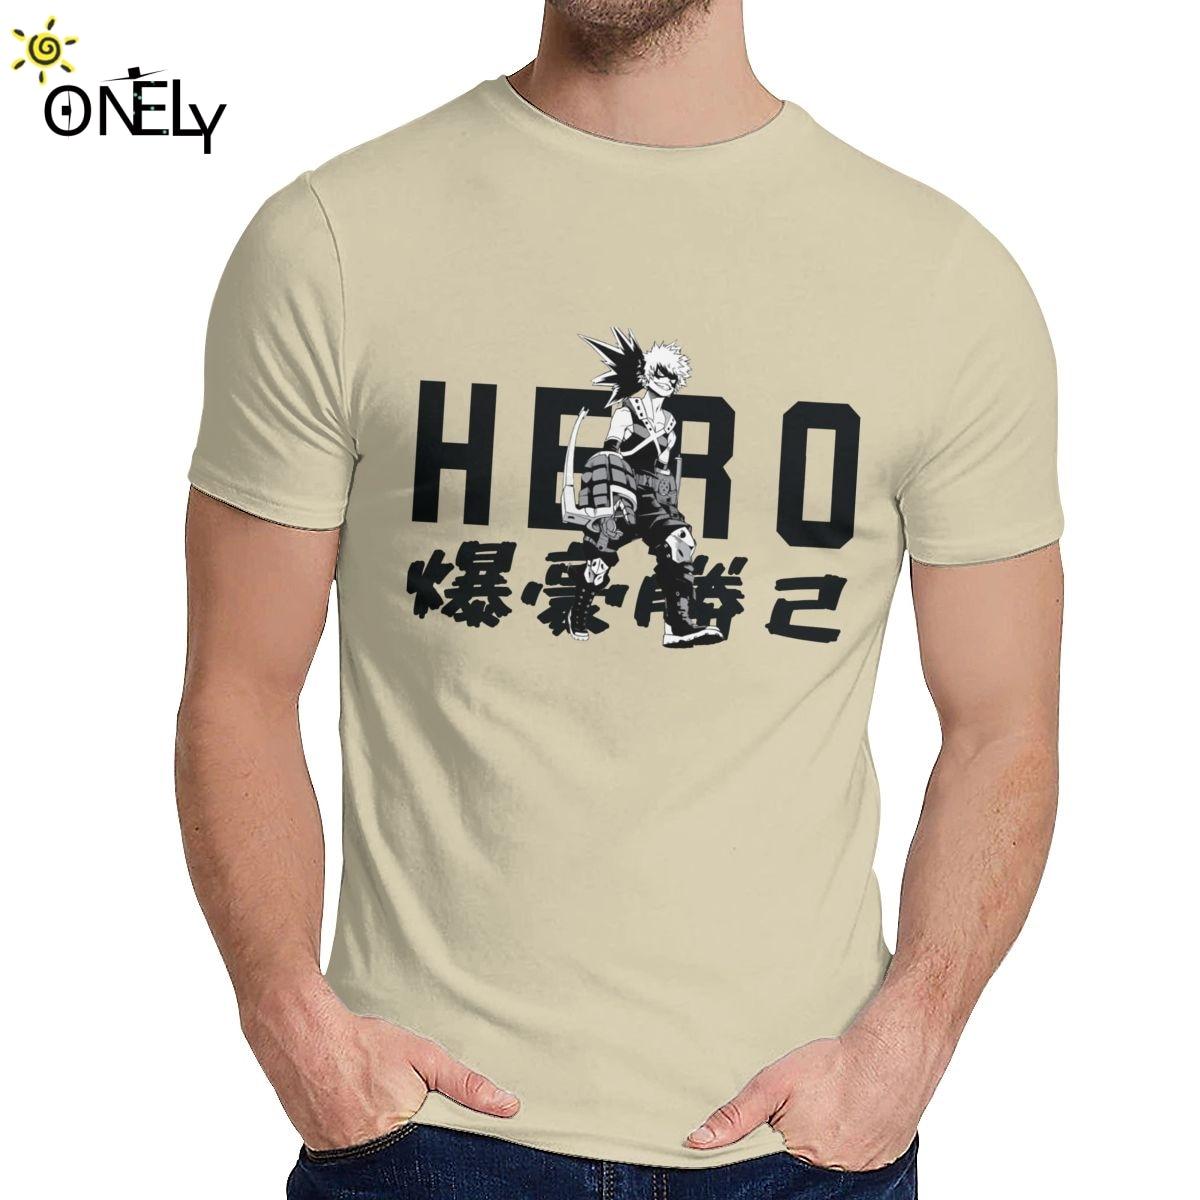 Camiseta Katsuki Bakugo, Camiseta informal para hombre de My Hero Academia, Camiseta suave de La talla grande para hombre